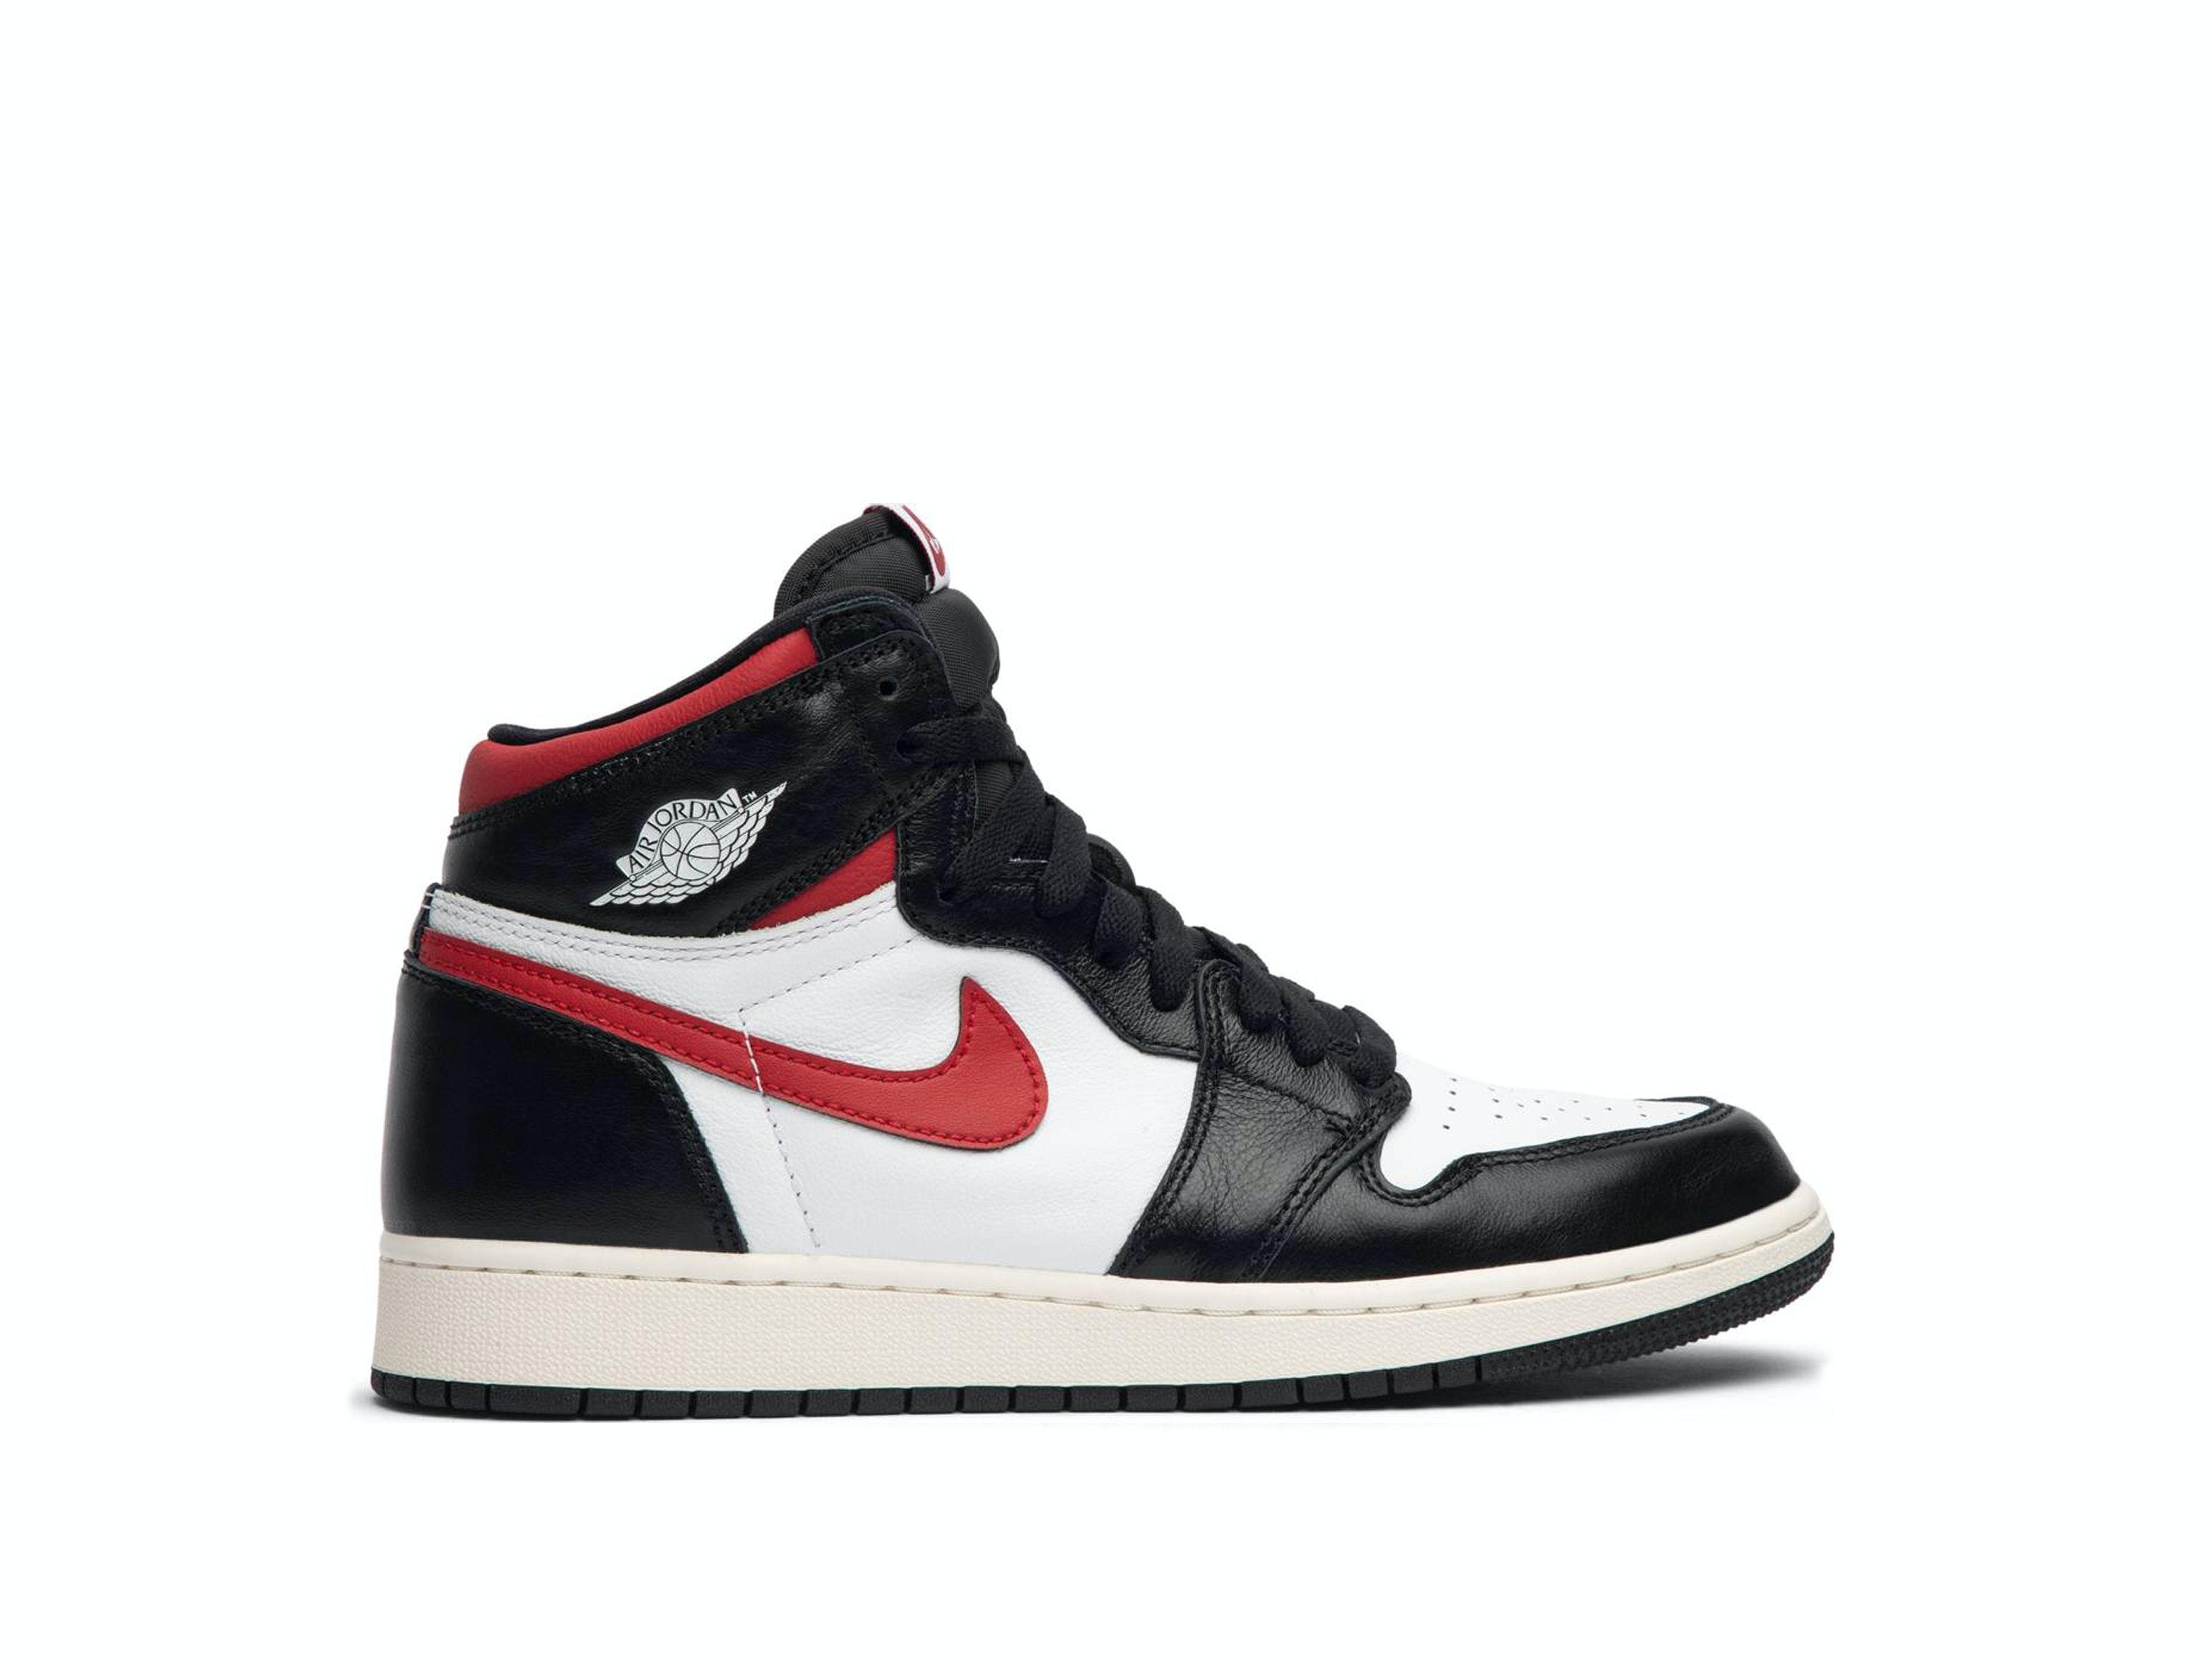 f35c26cc081 Shop Air Jordan 1 Retro High Black Gym Red (GS) Online | Laced